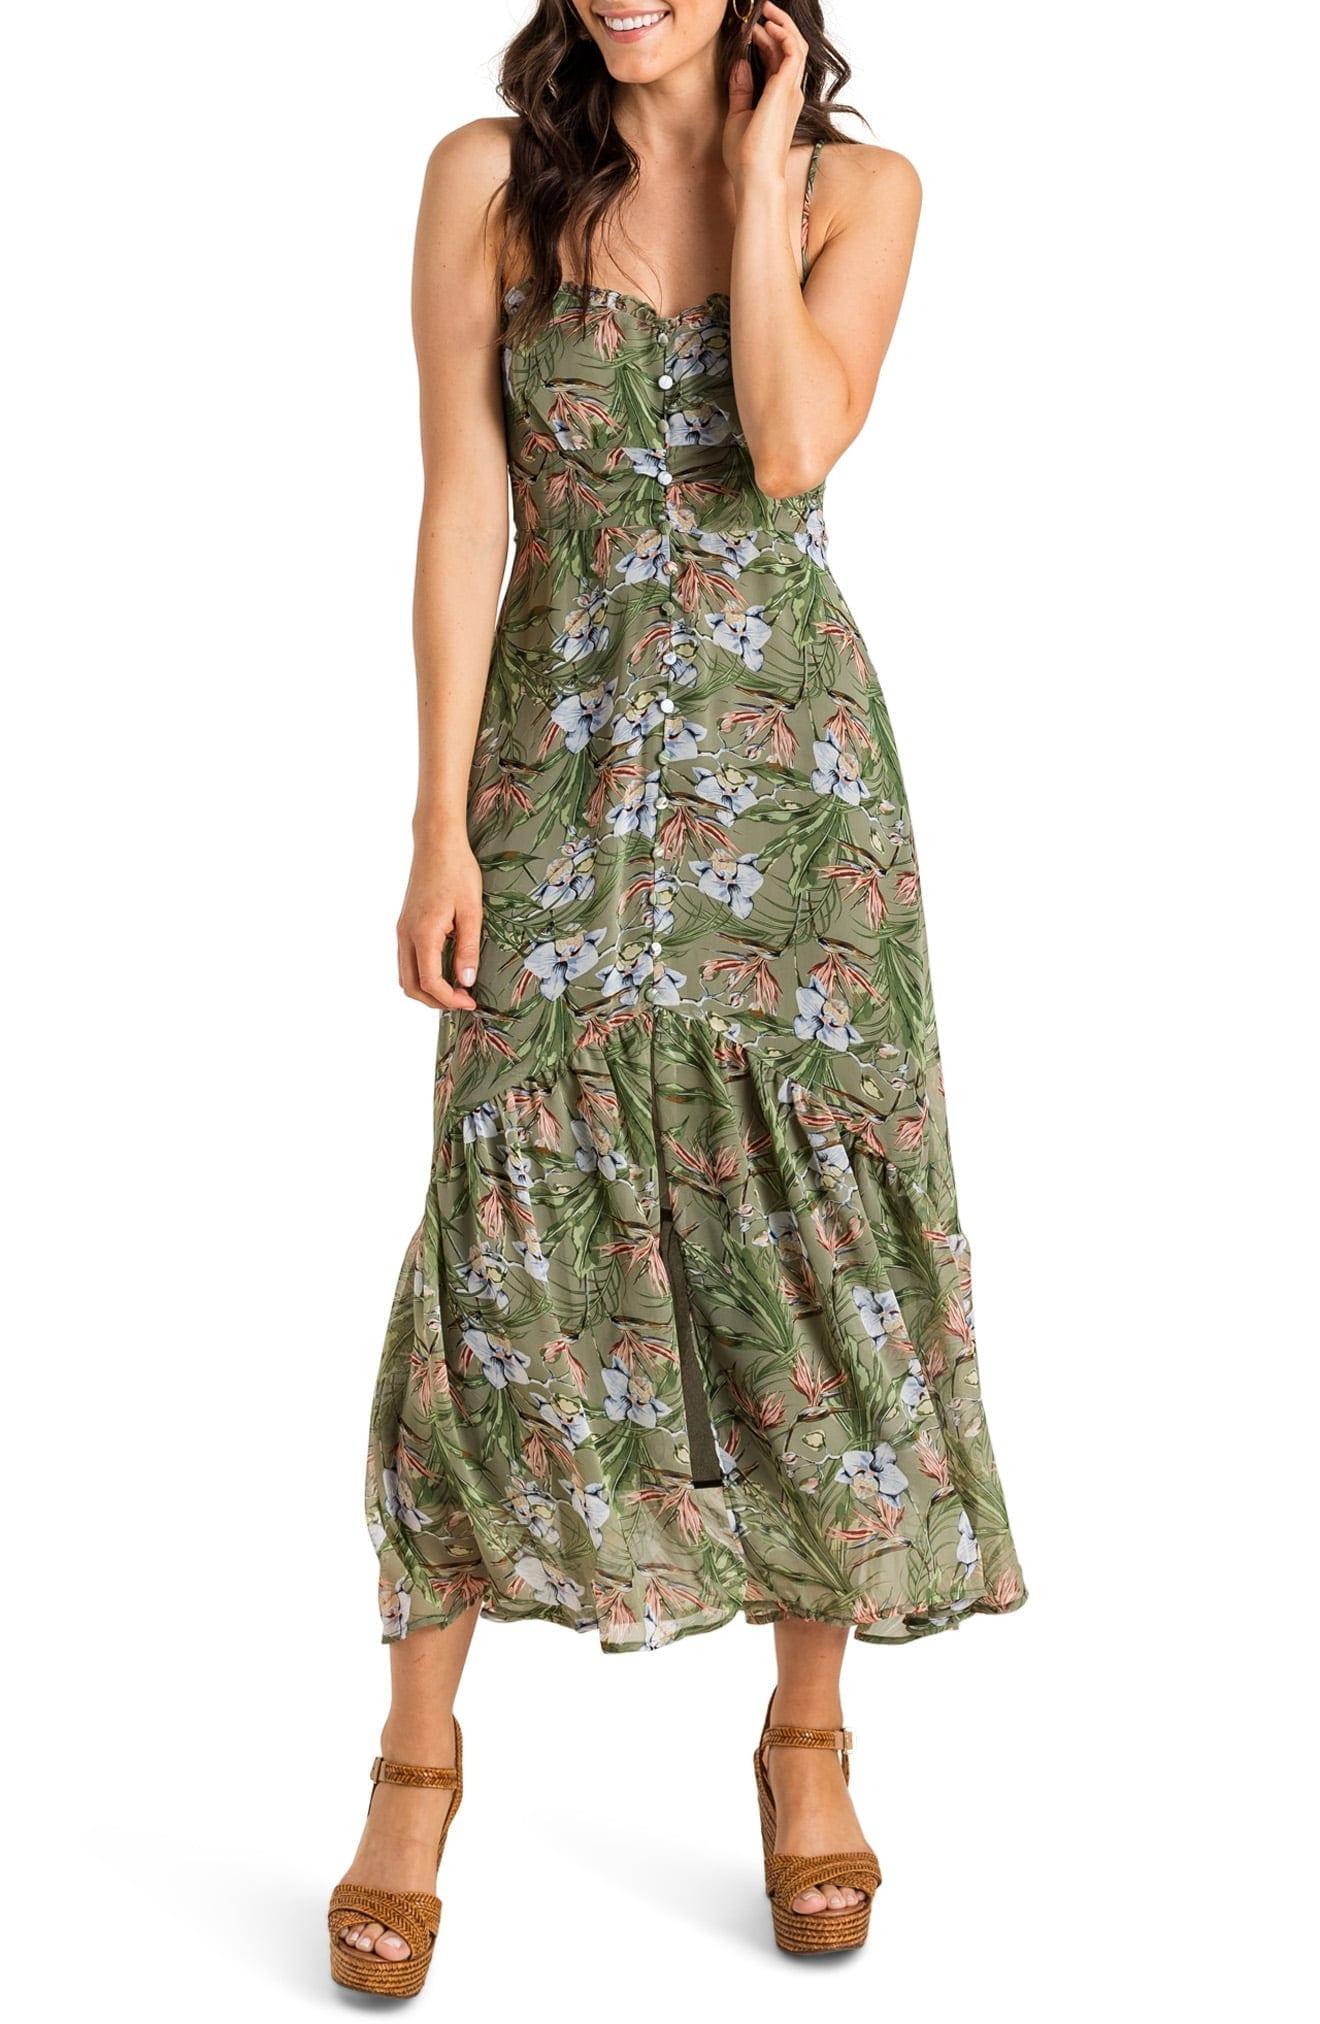 ALL IN FAVOR Sleeveless Button Detail Maxi Dress